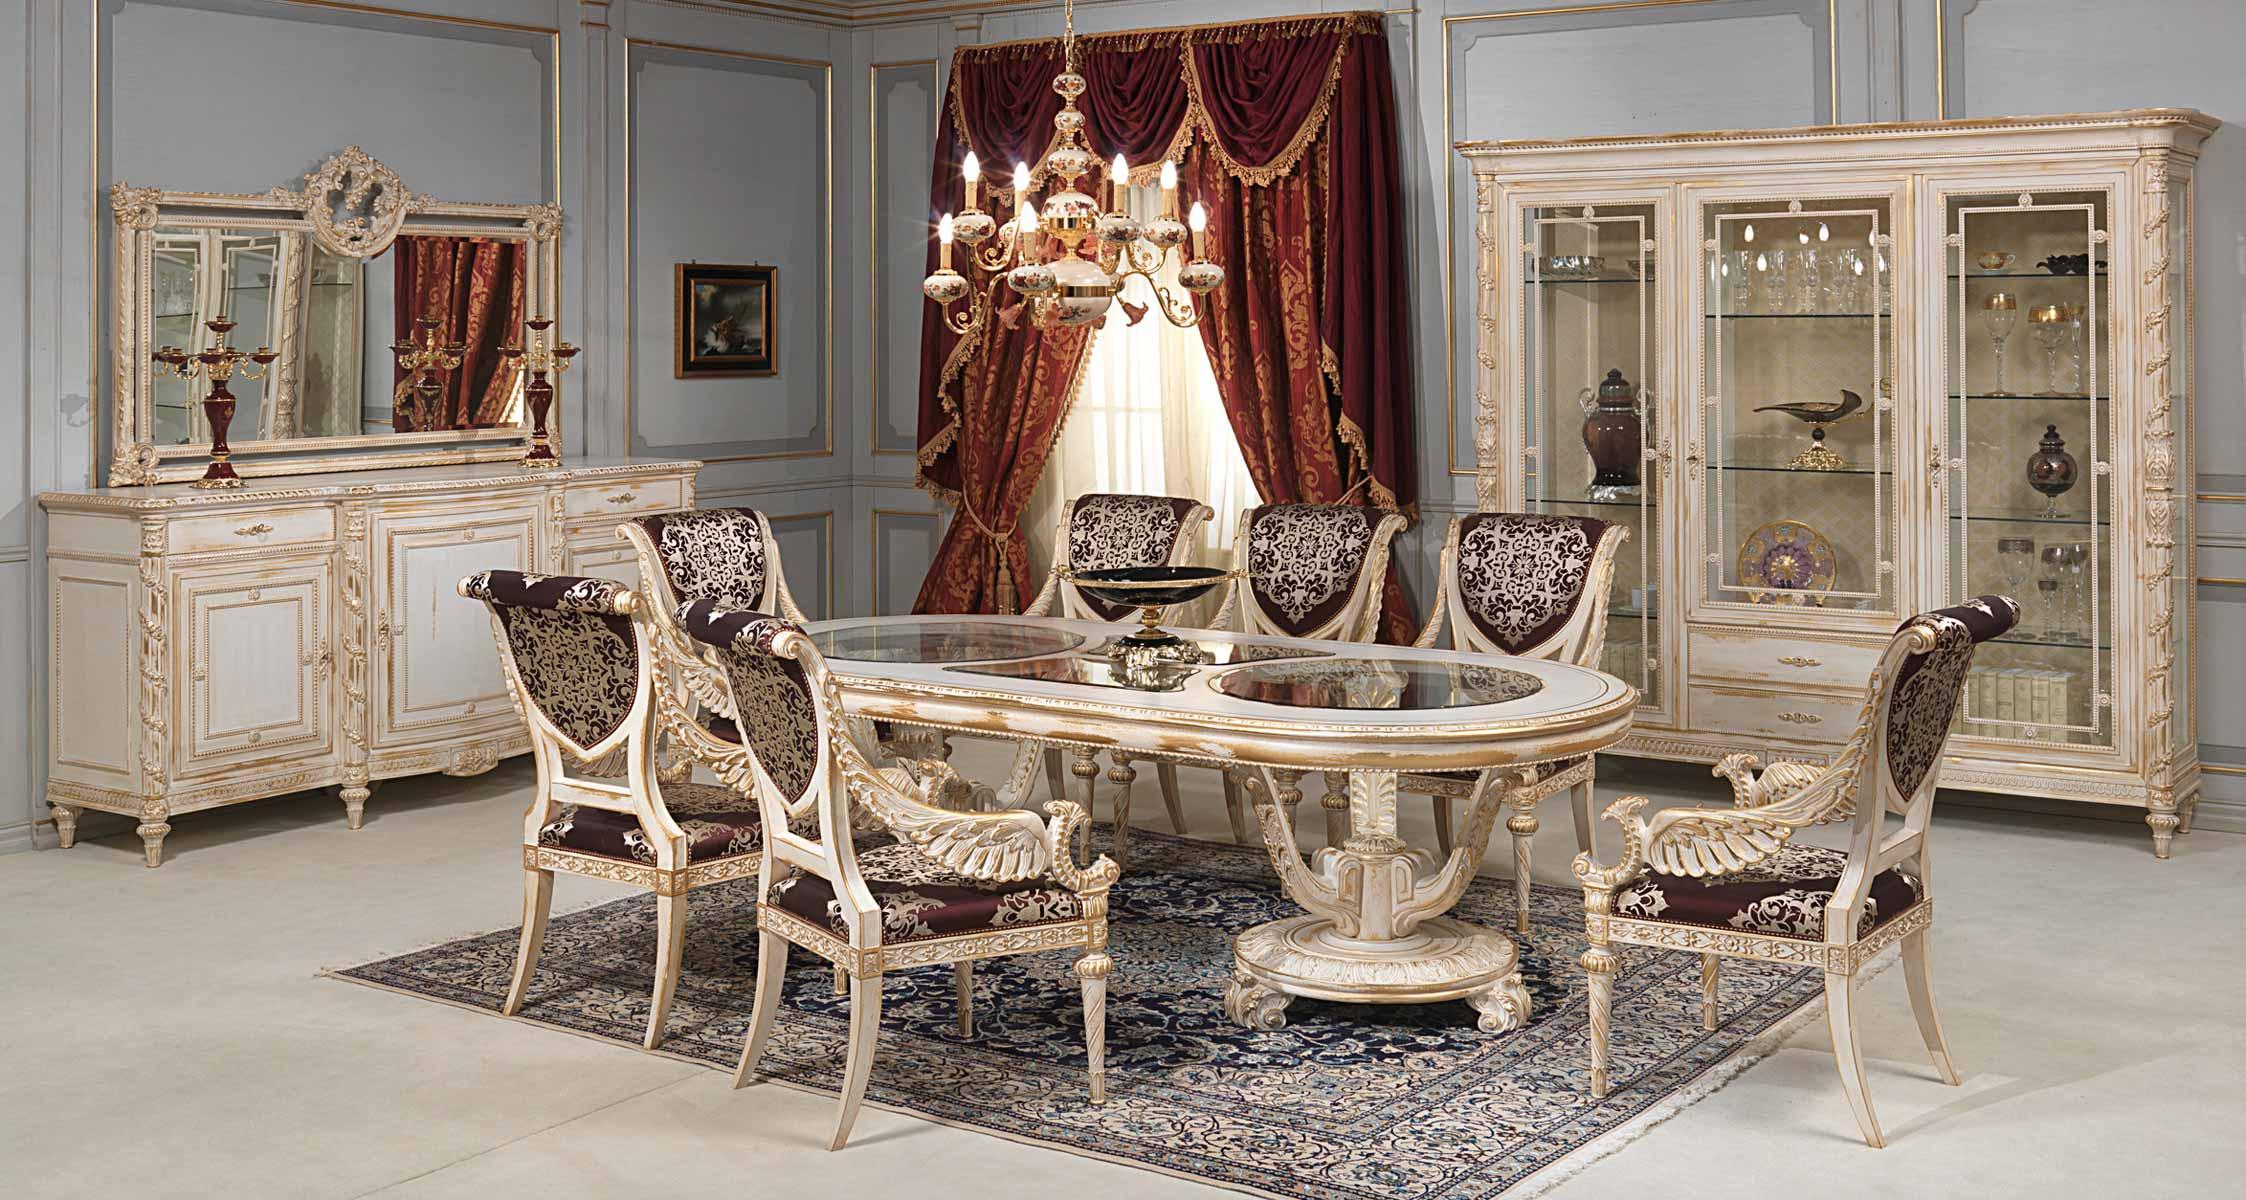 Sala Da Pranzo White And Gold In Stile Luigi Xvi